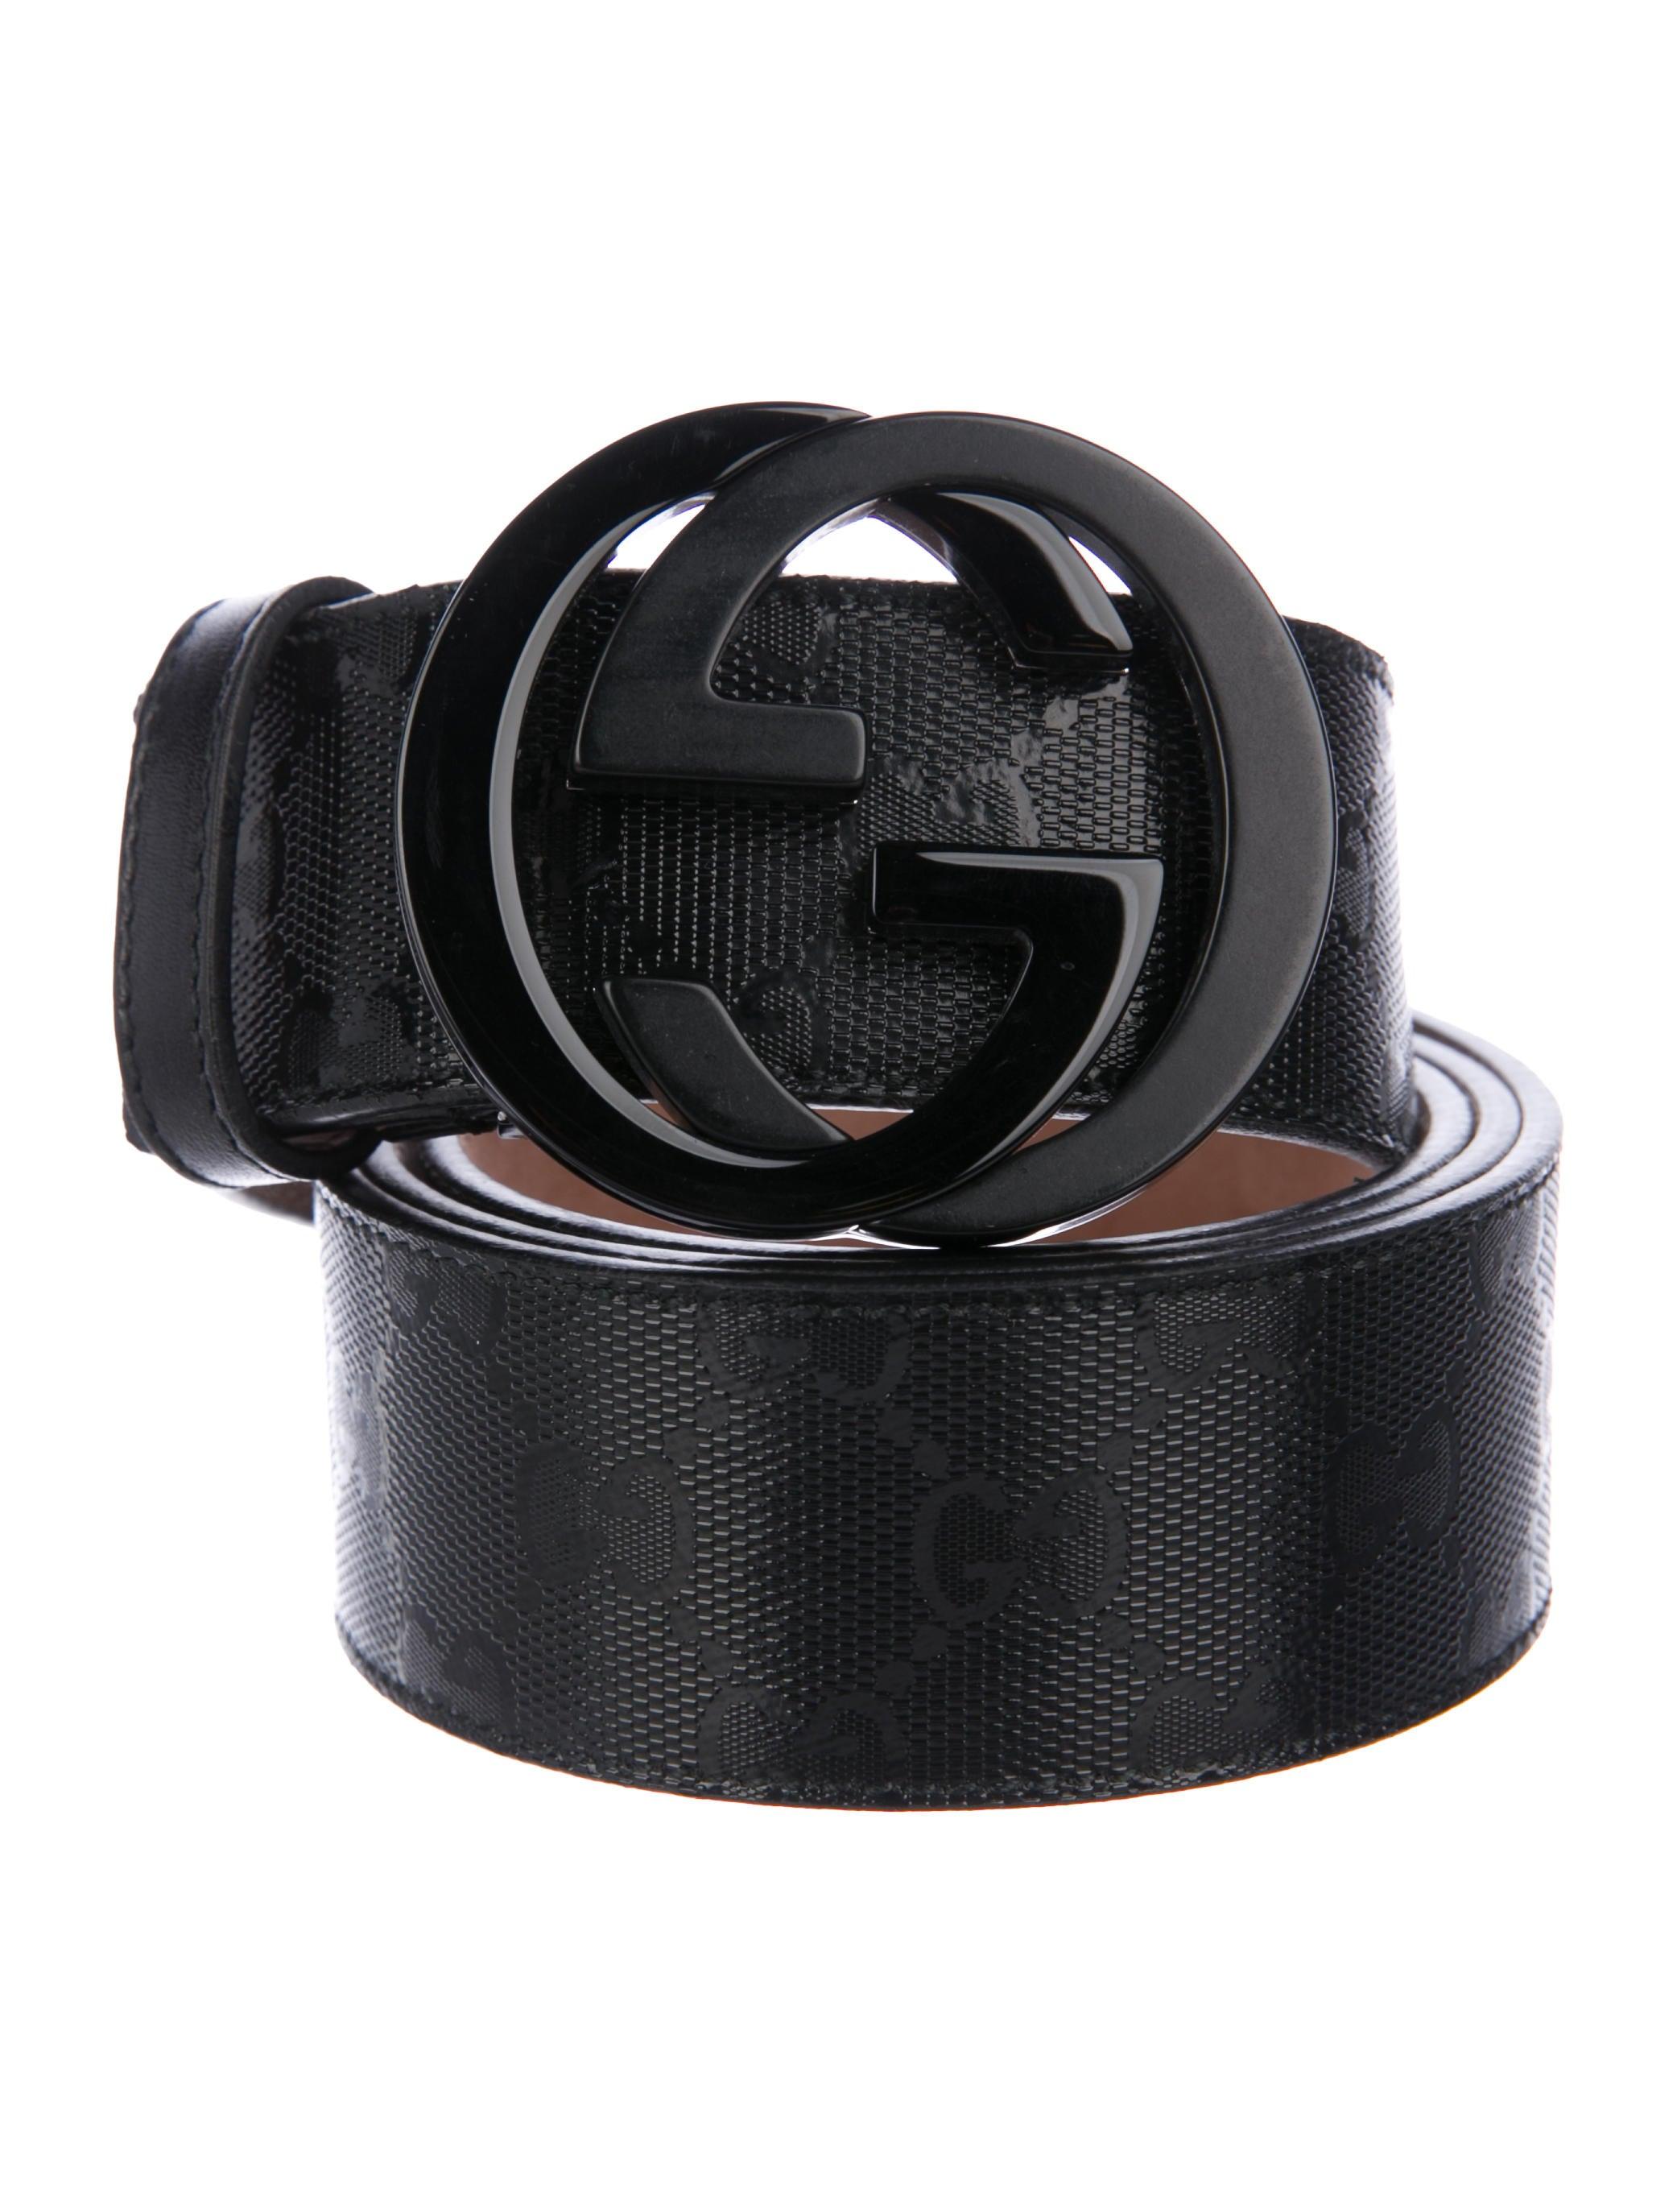 1b8ce2054d5 Gucci GG Imprimé Belt - Accessories - GUC233123